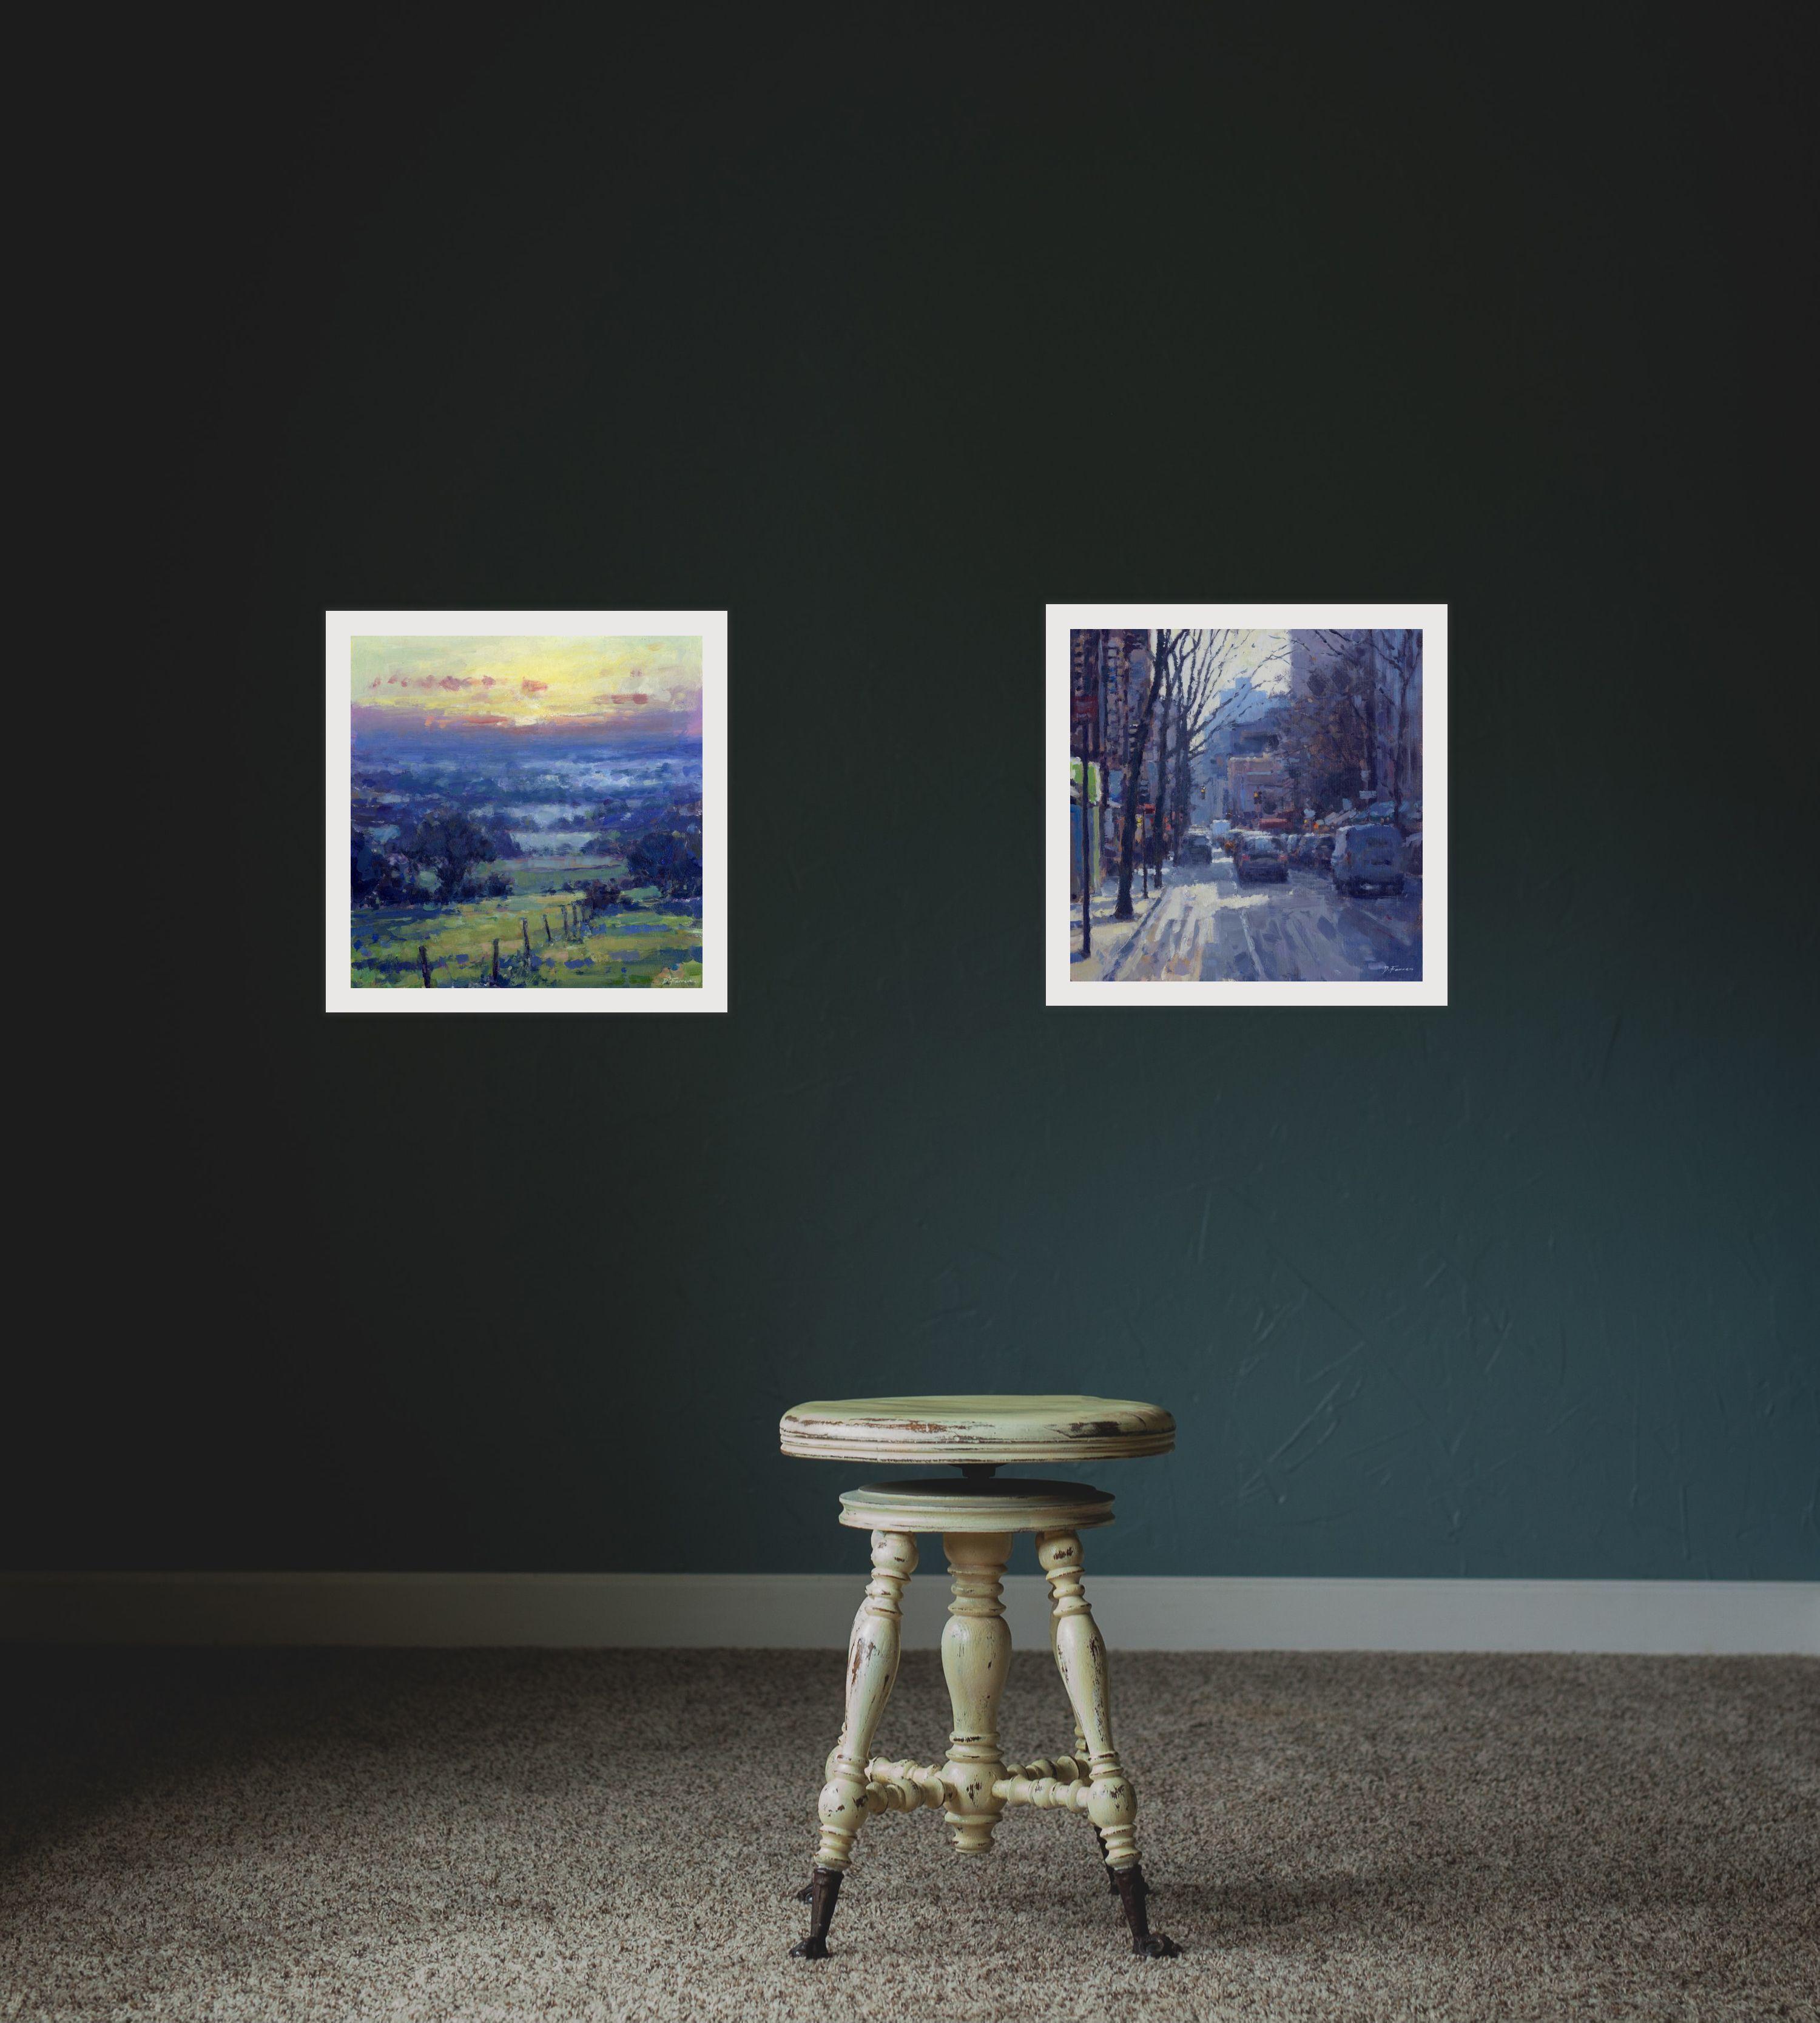 David-farren-gallery-set-up